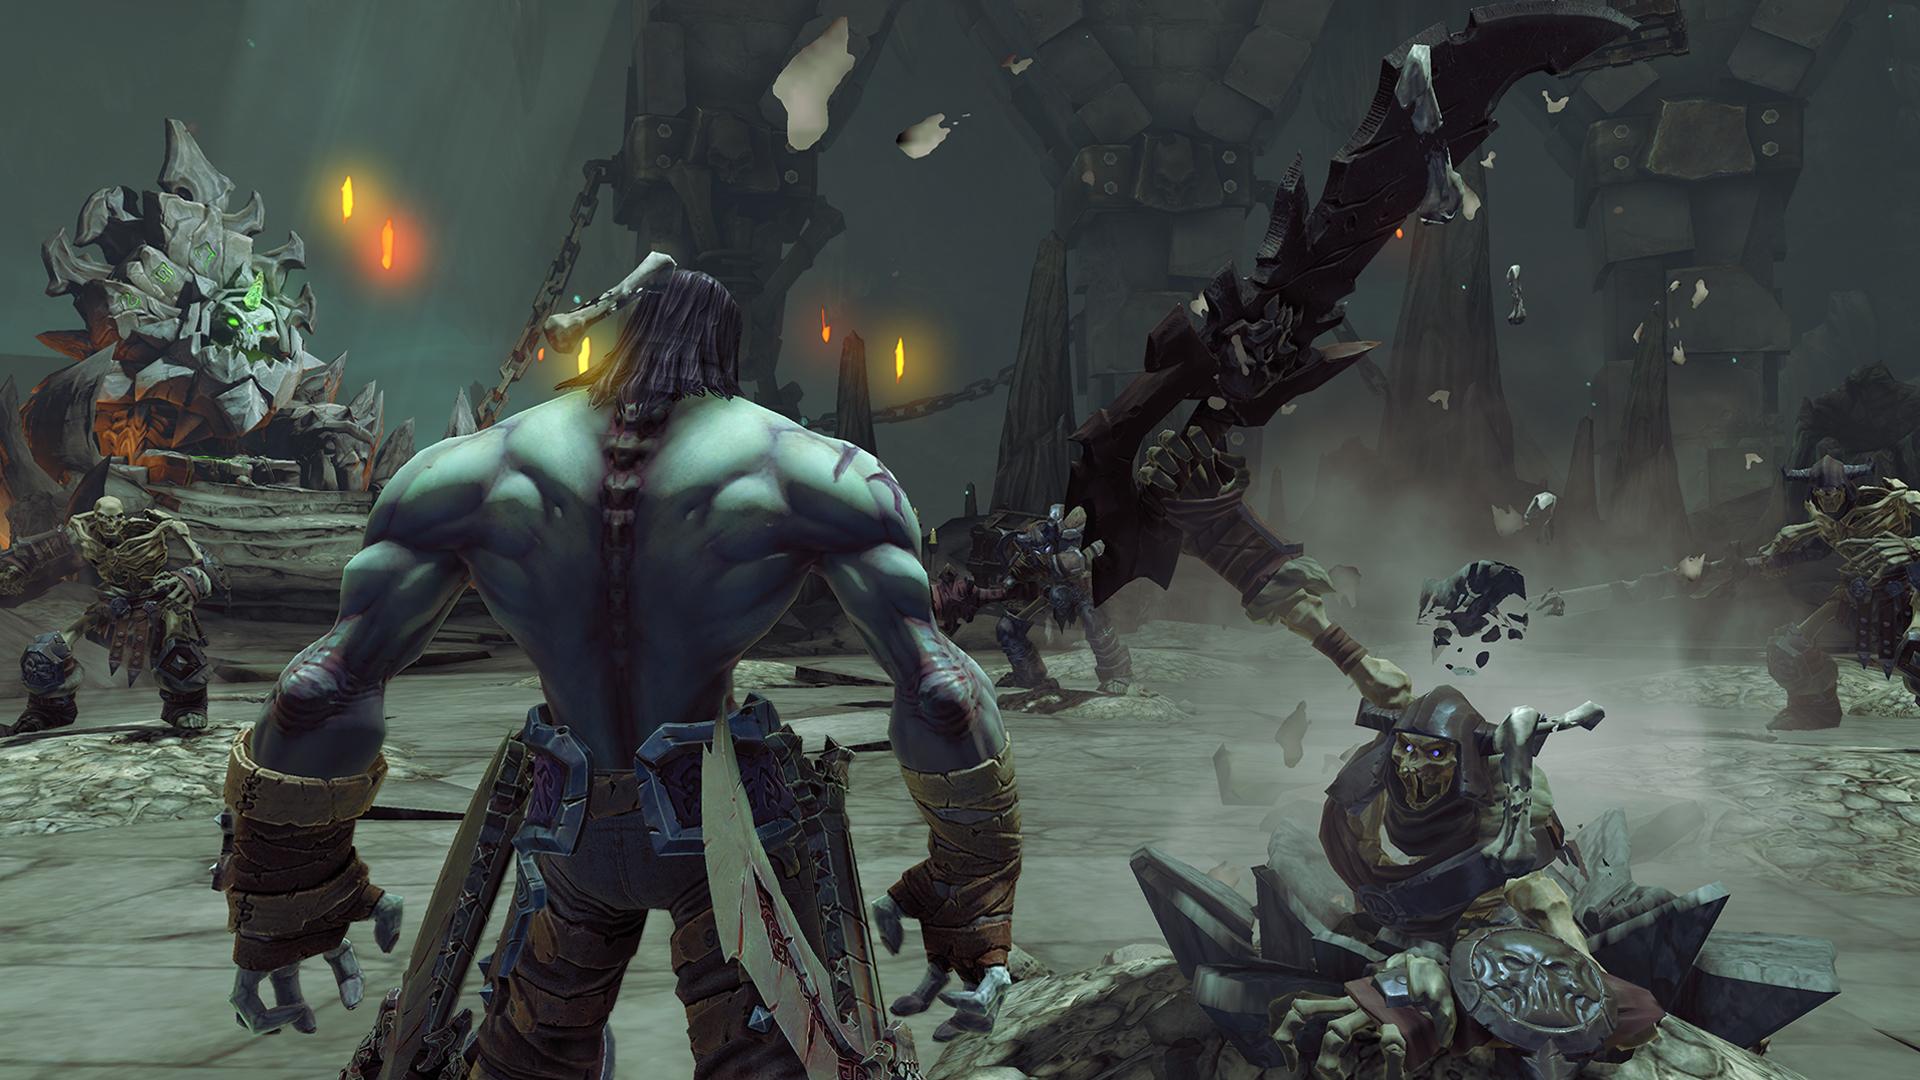 Darksiders II: Deathinitive Edition screenshot 2